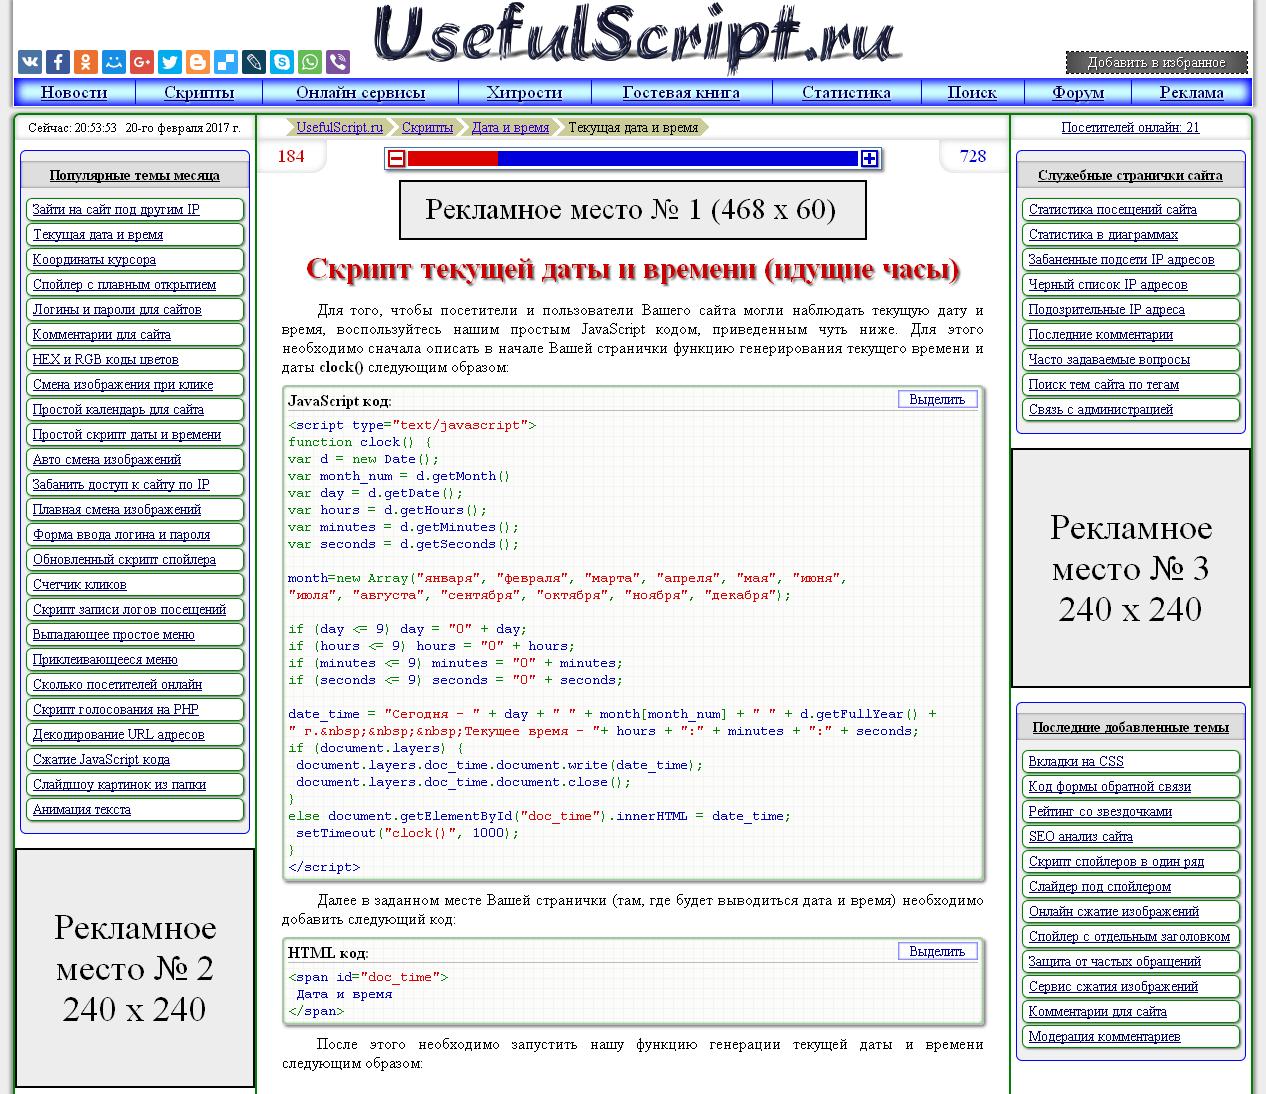 автоматическая смена картинки на сайте